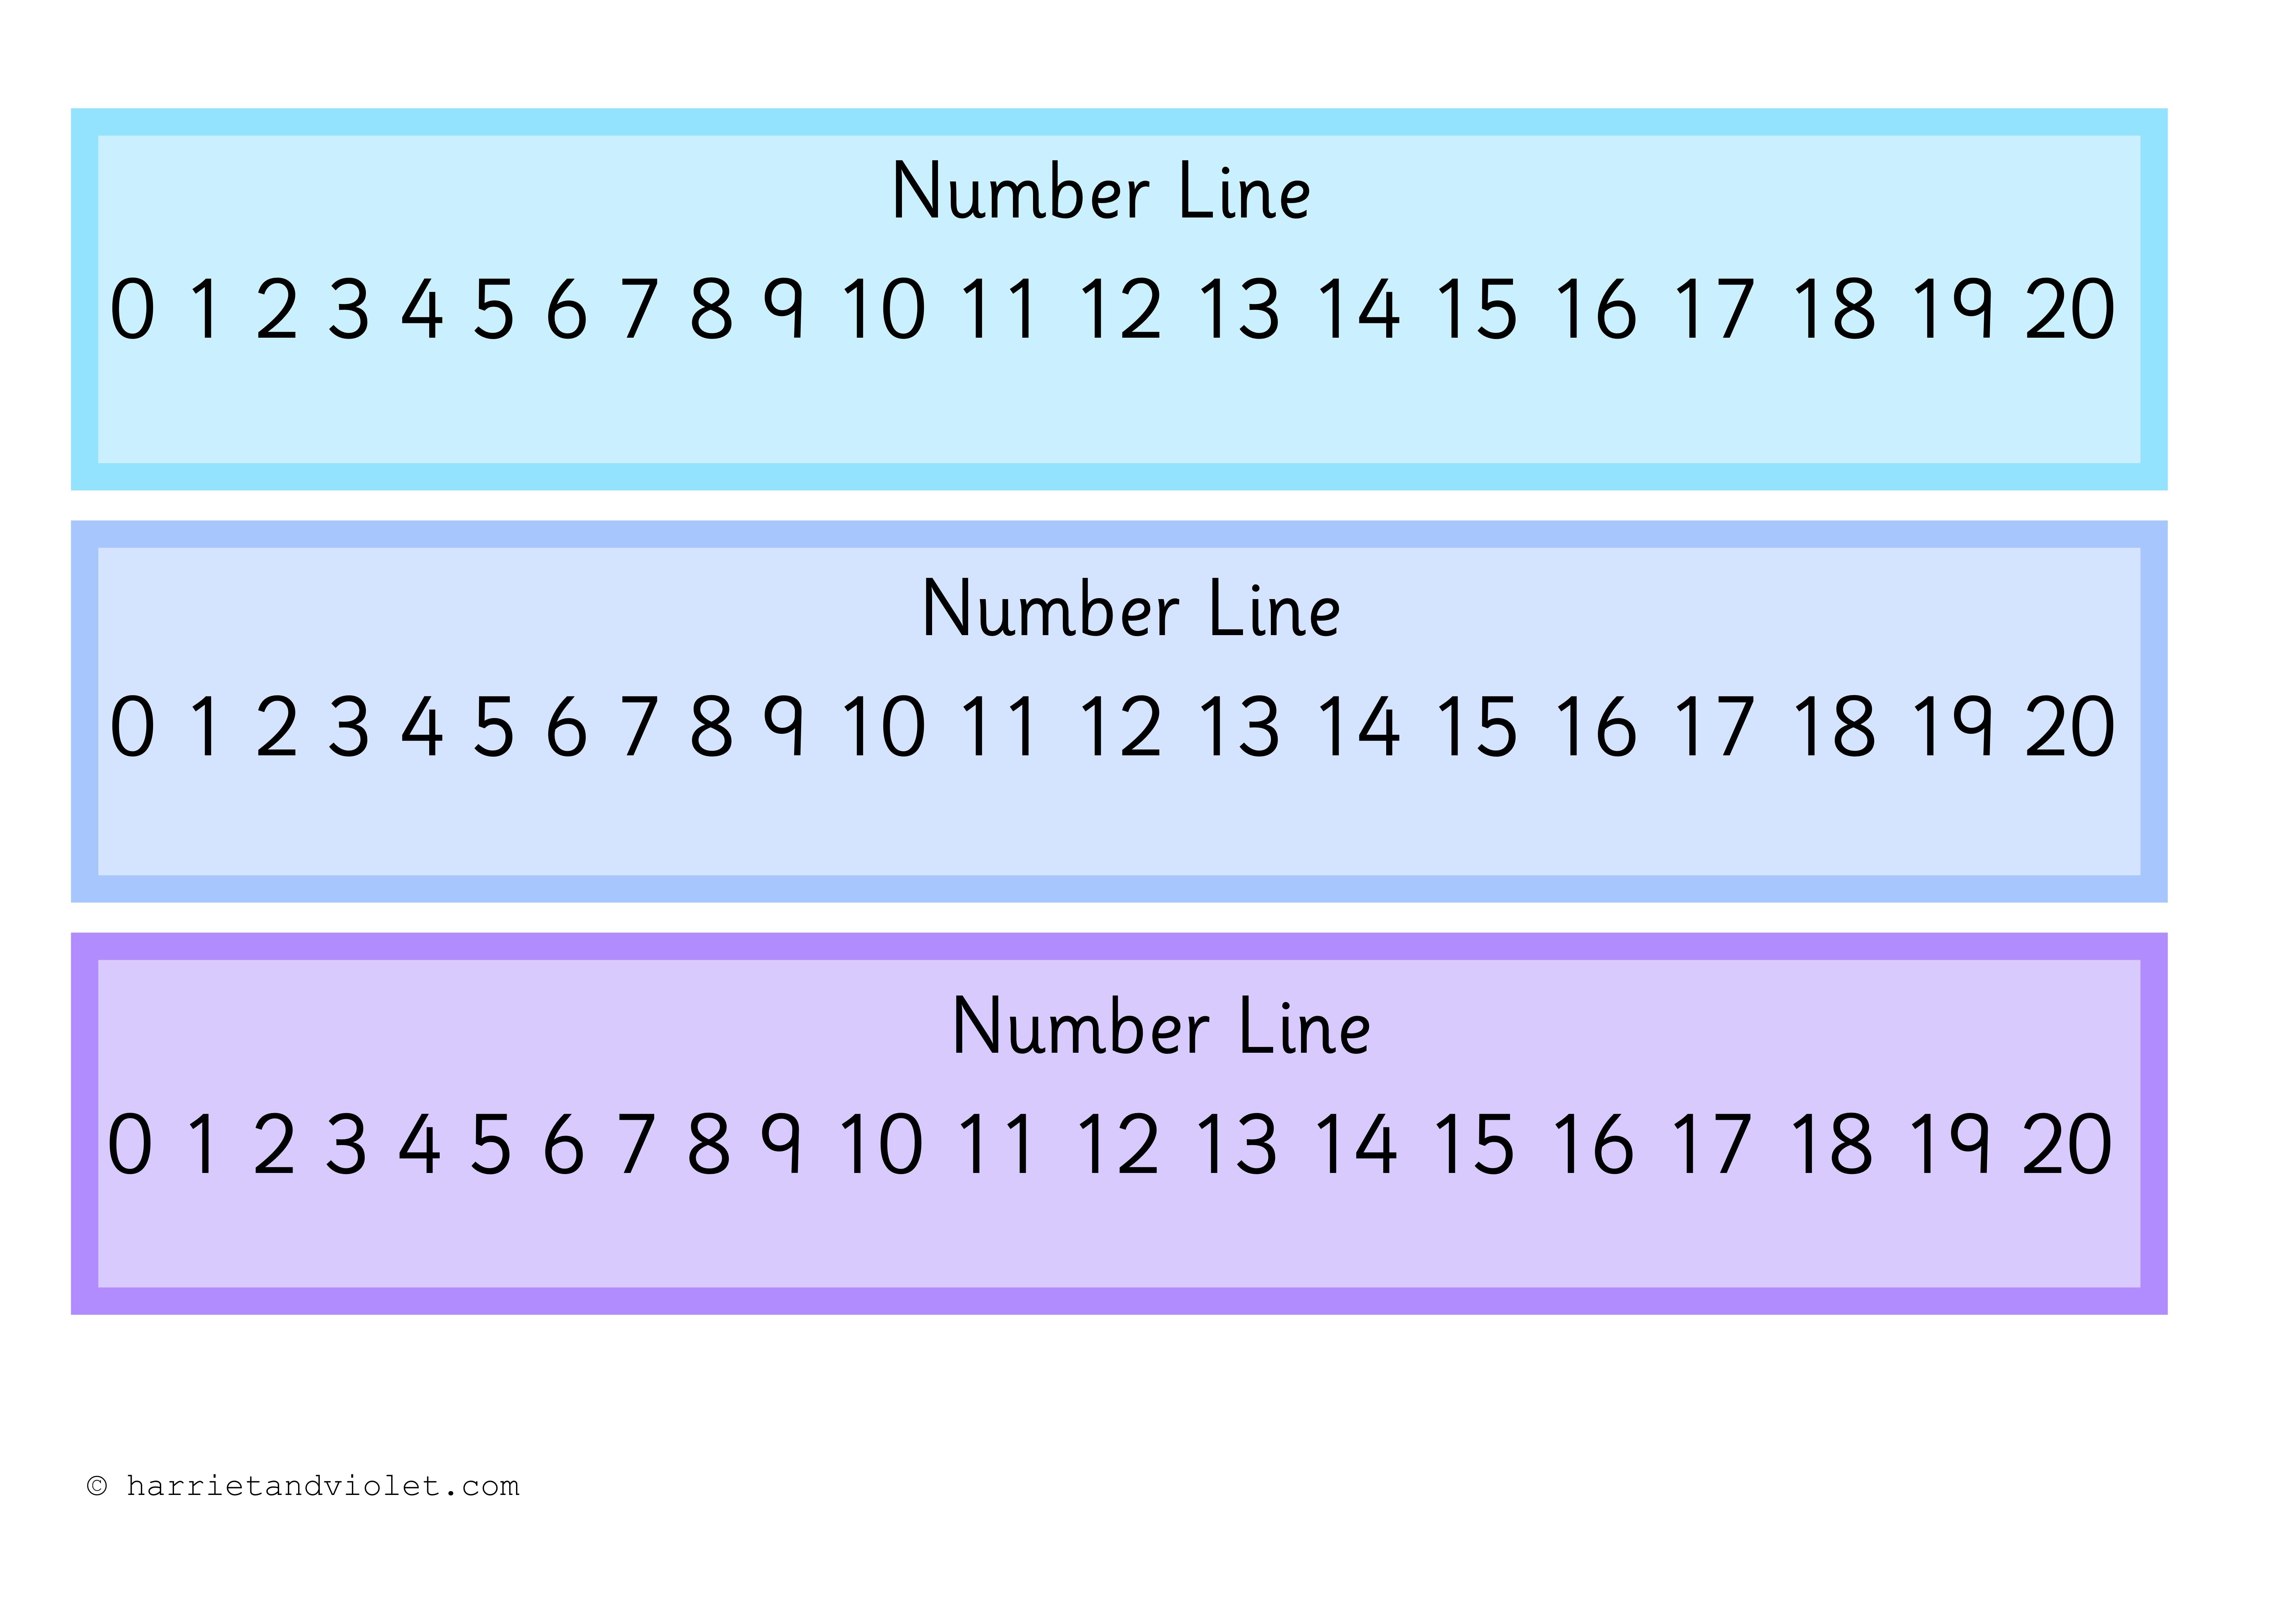 Worksheet Ks1 Number Line free teaching resources eyfs ks1 ks2 primary teachers number line 0 20 harriet violet resources